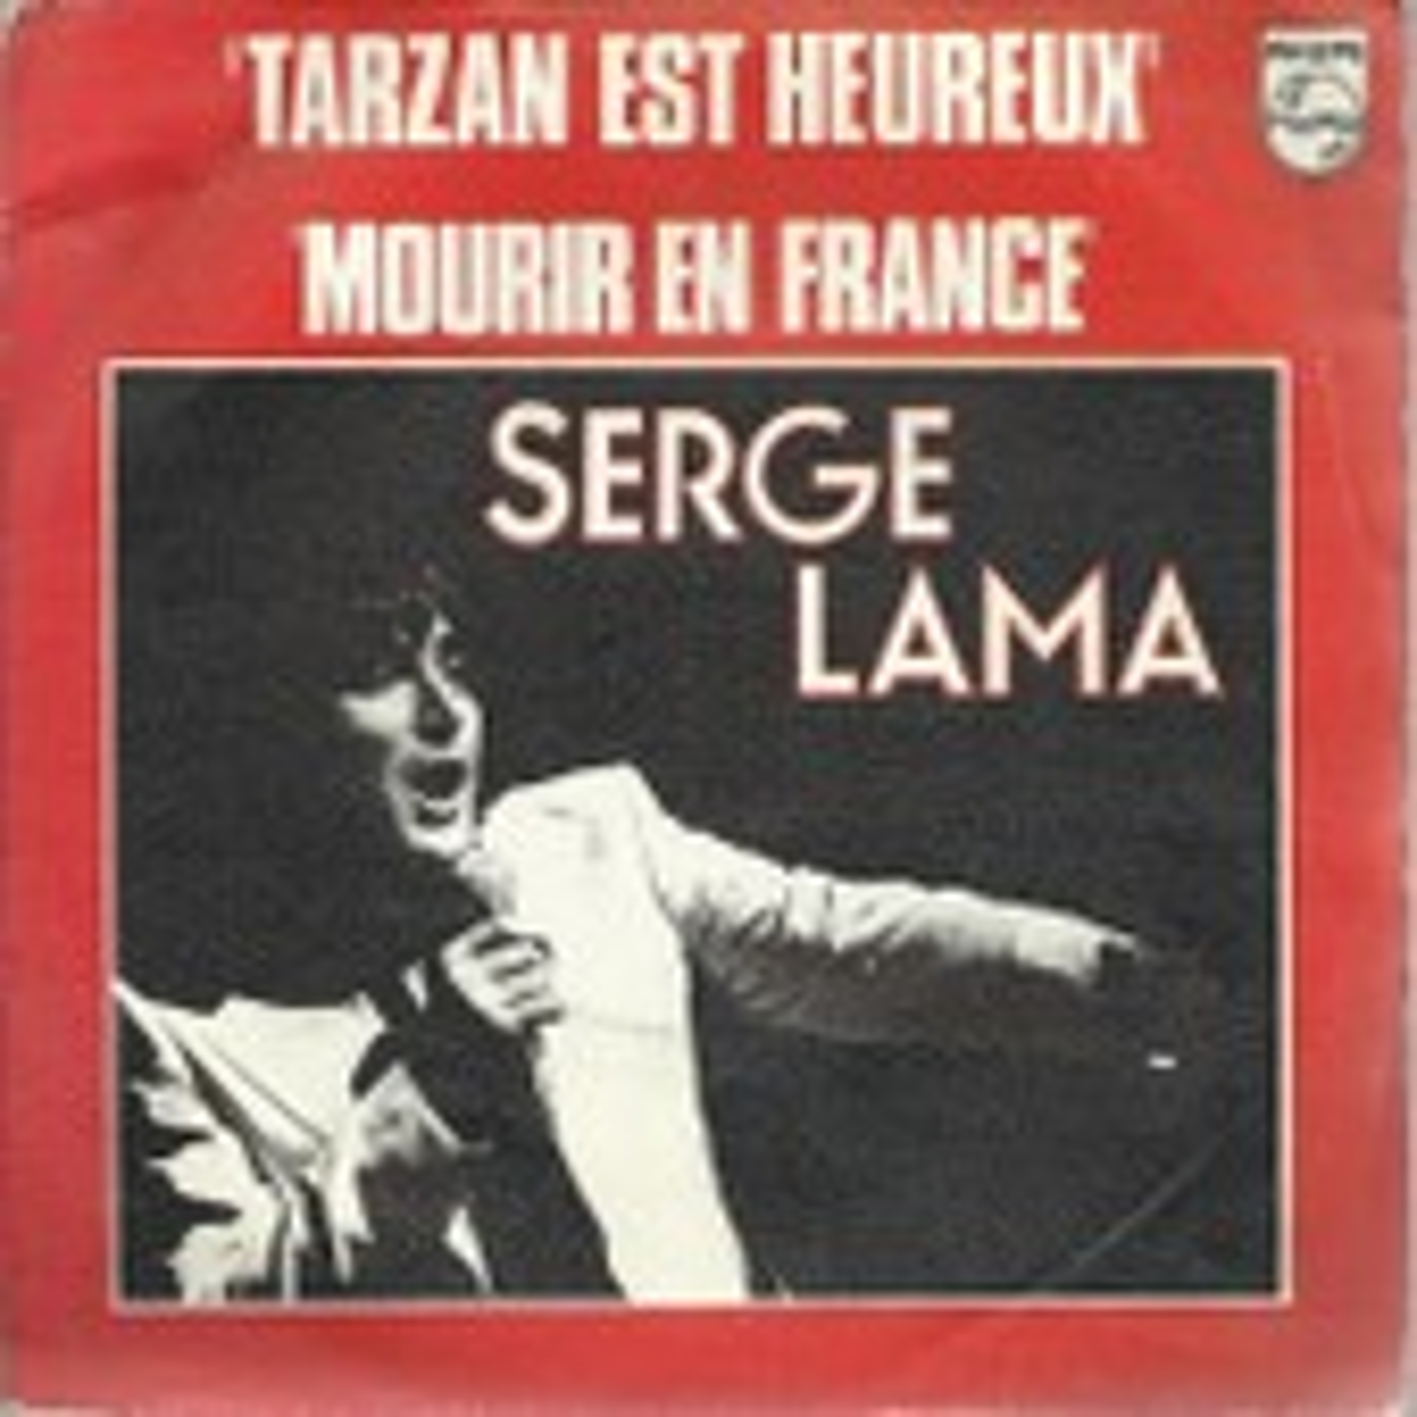 Mourir En France (Alice Dona / Serge Lama) 3'10 / Tarzan Est Heureux (Y. Gilbert / S. Lama) 3'35 - Serge Lama